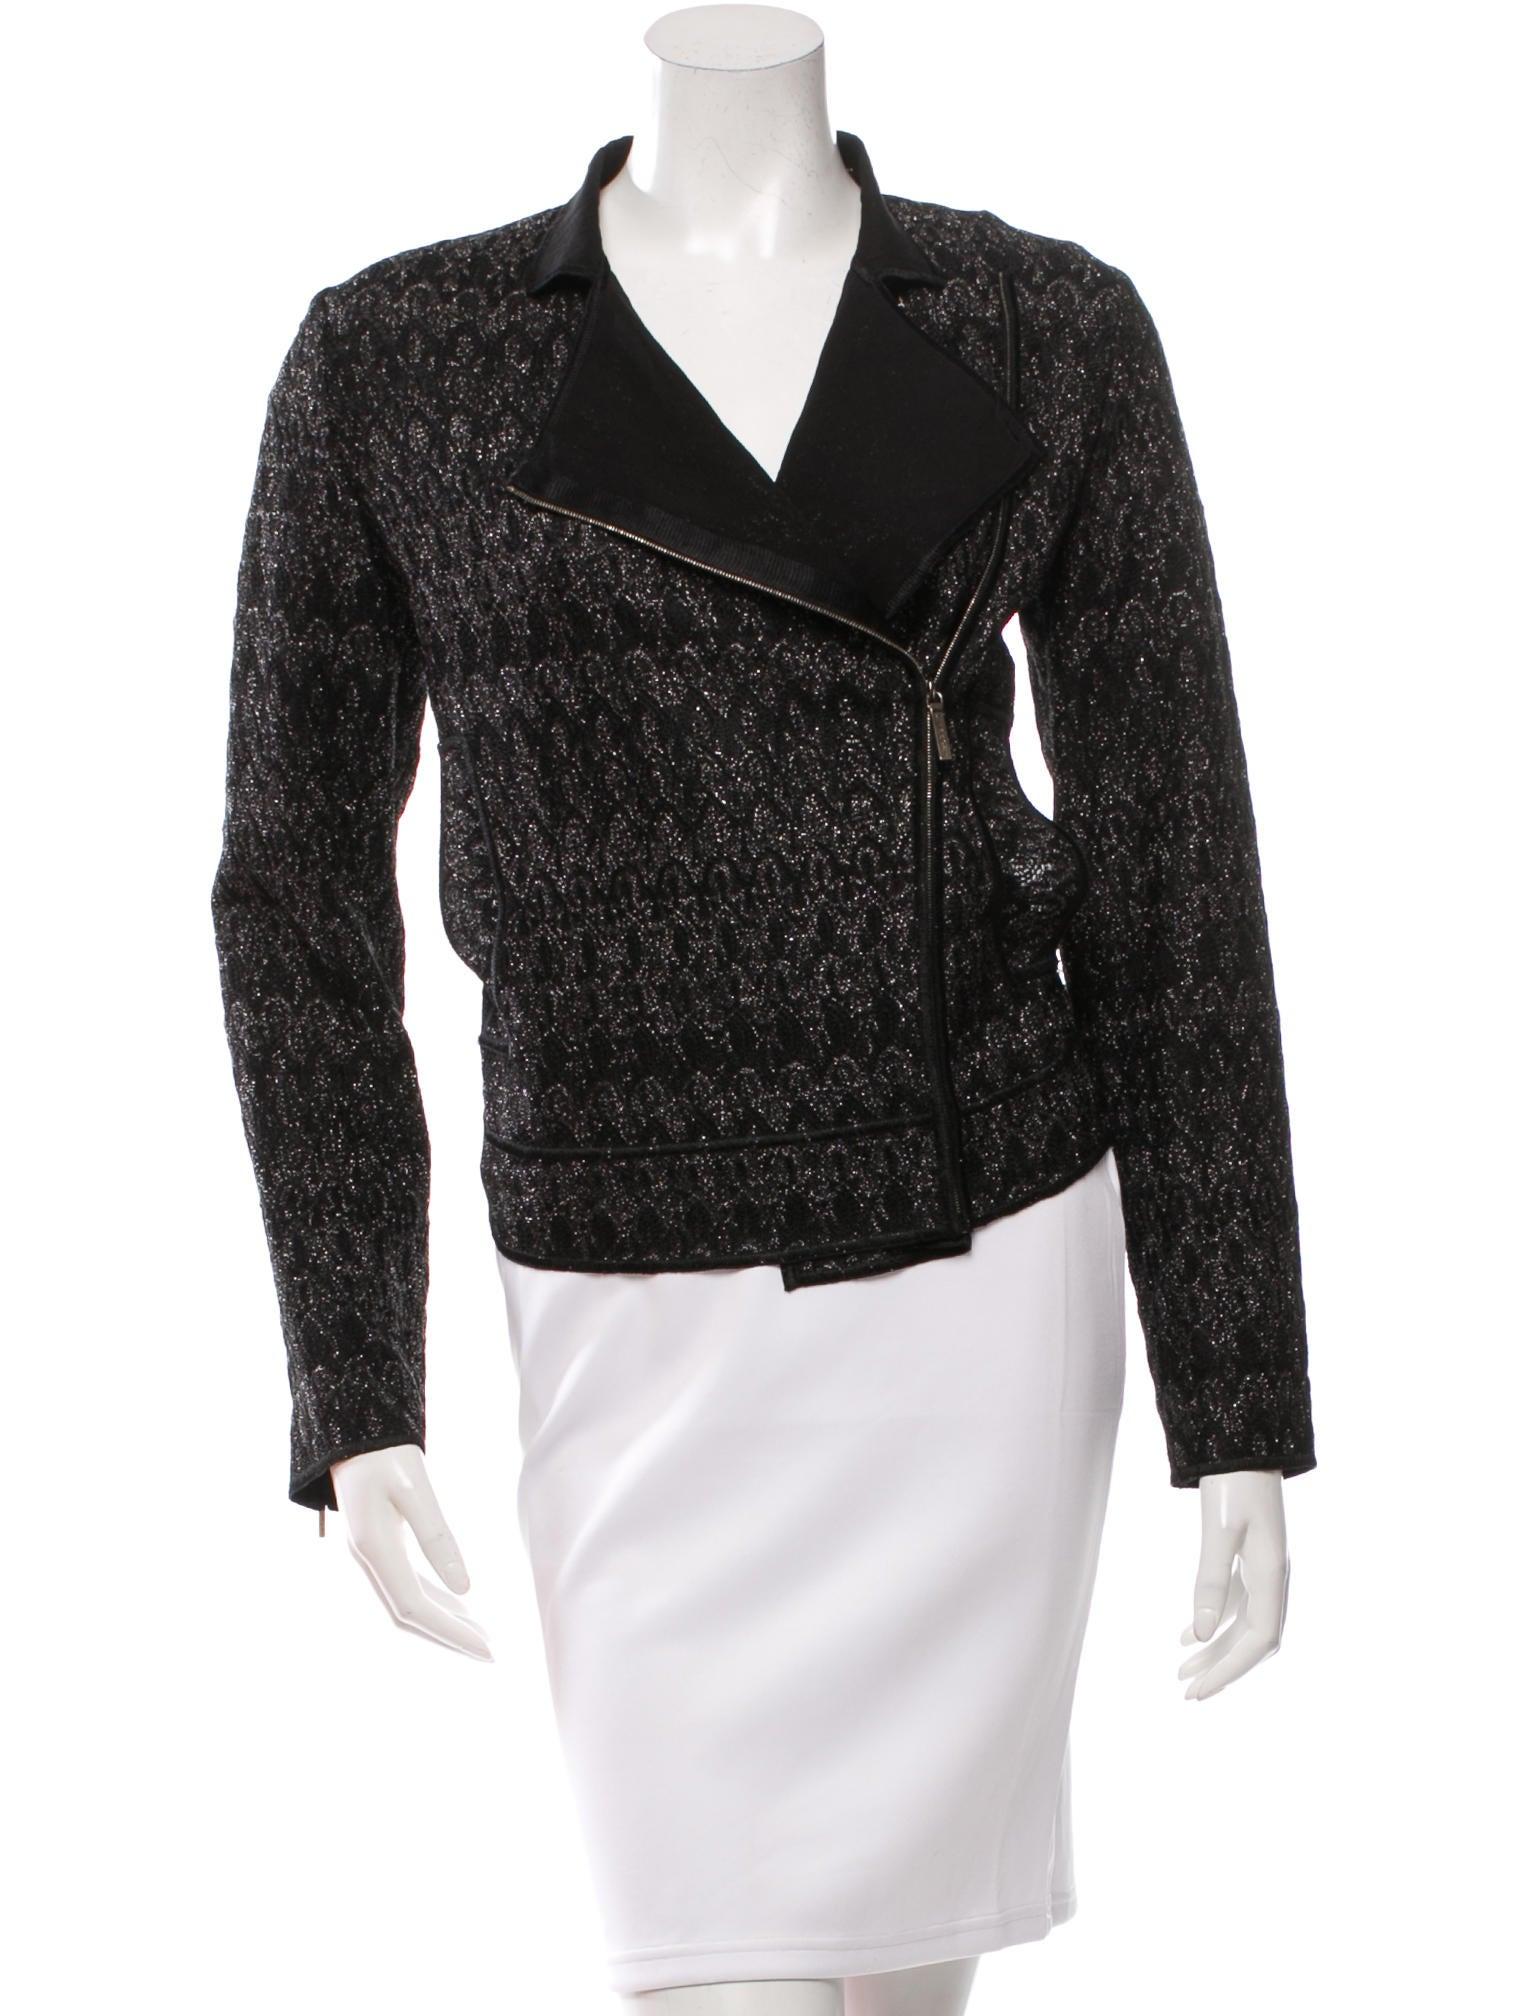 Missoni Knit Moto Jacket - Clothing - MIS35915 | The RealReal